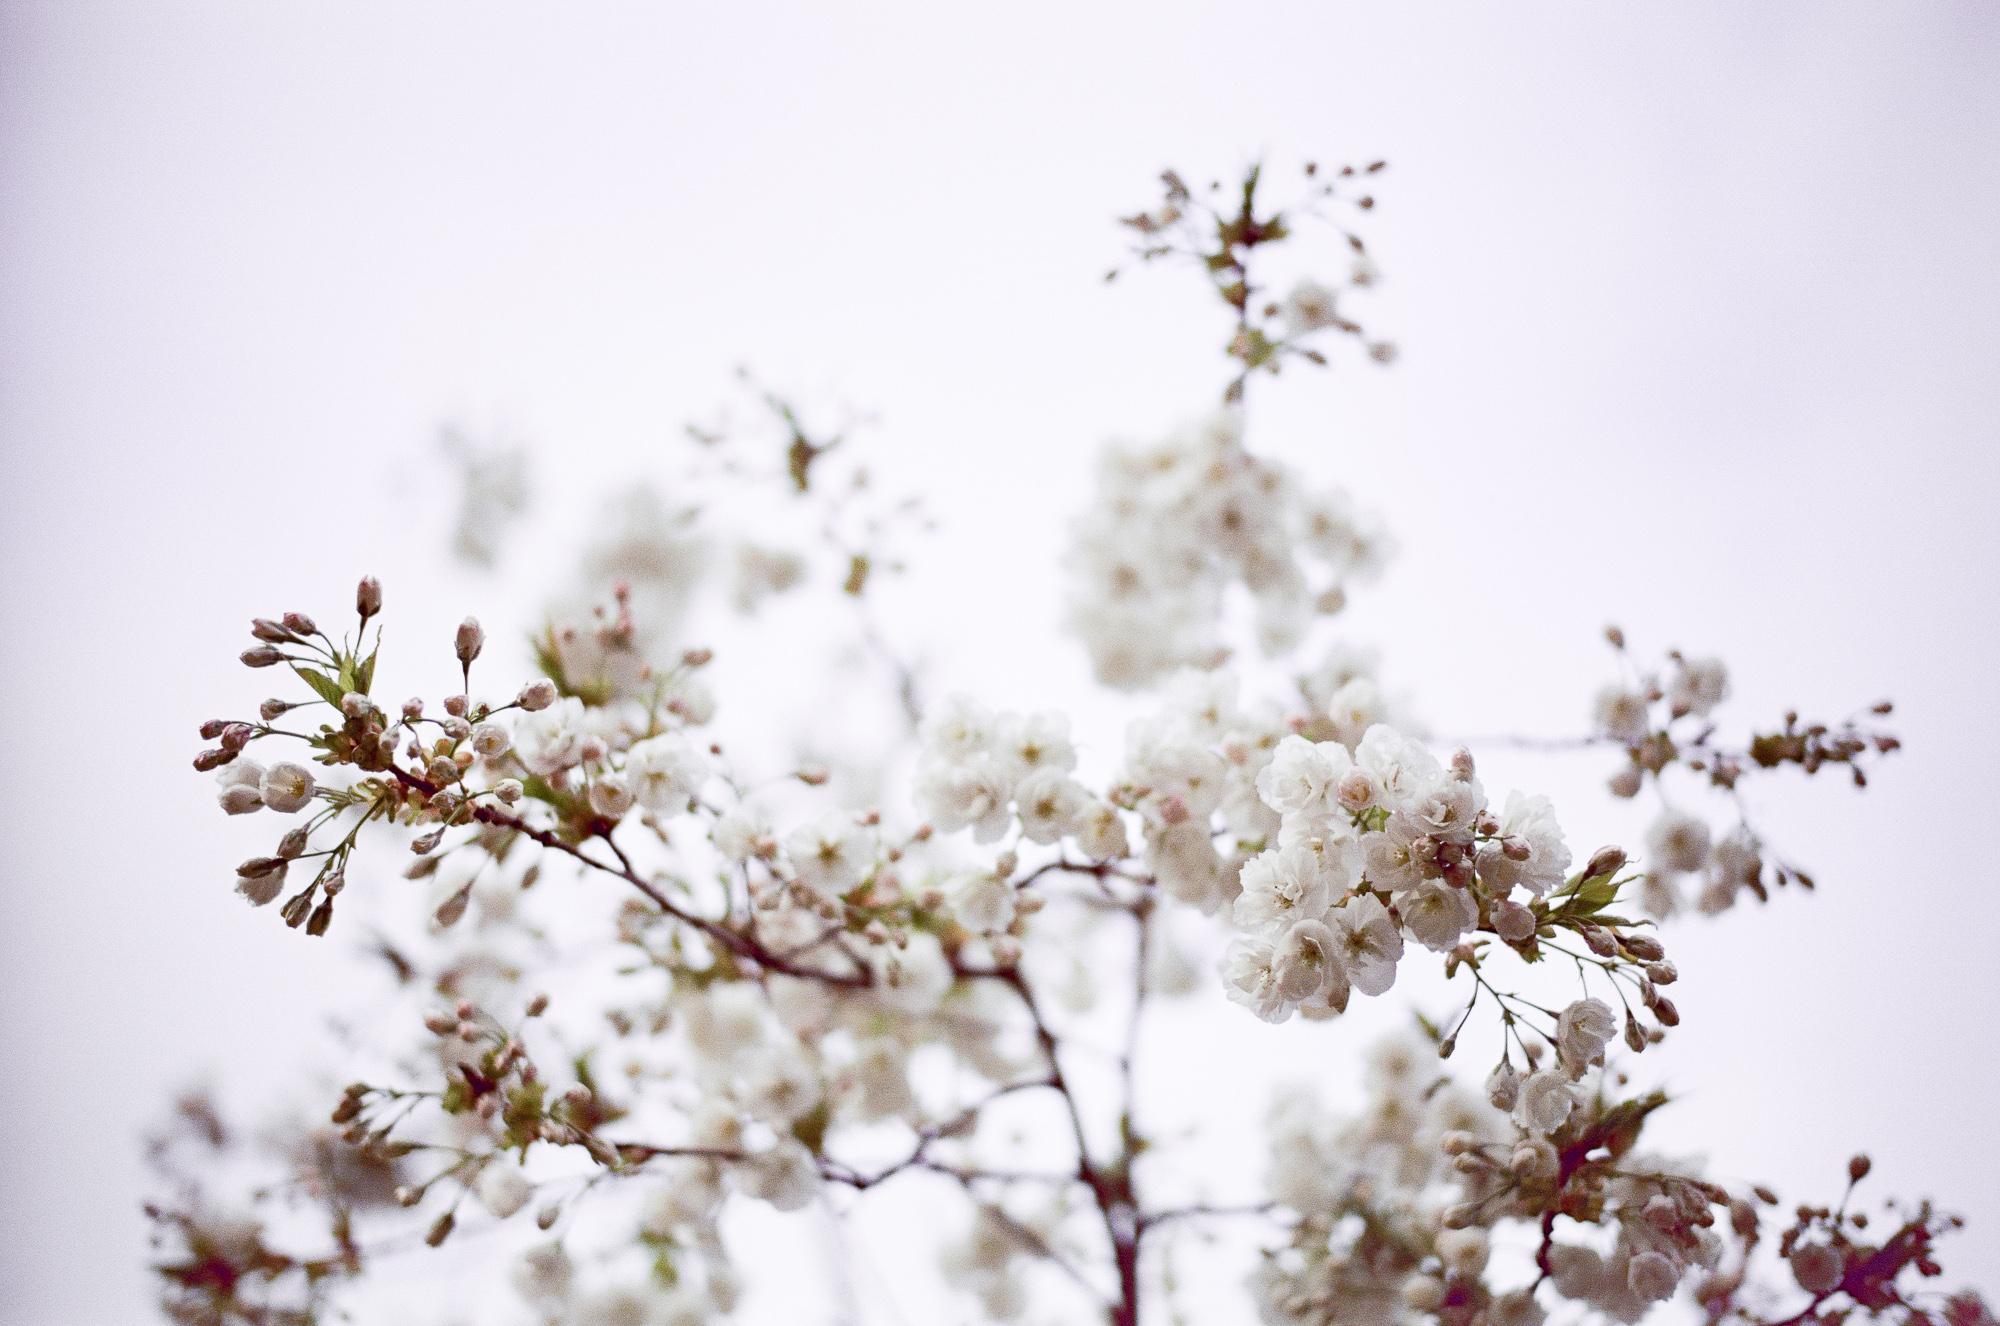 london-photographer-ksenia-zizina-flower-power-3